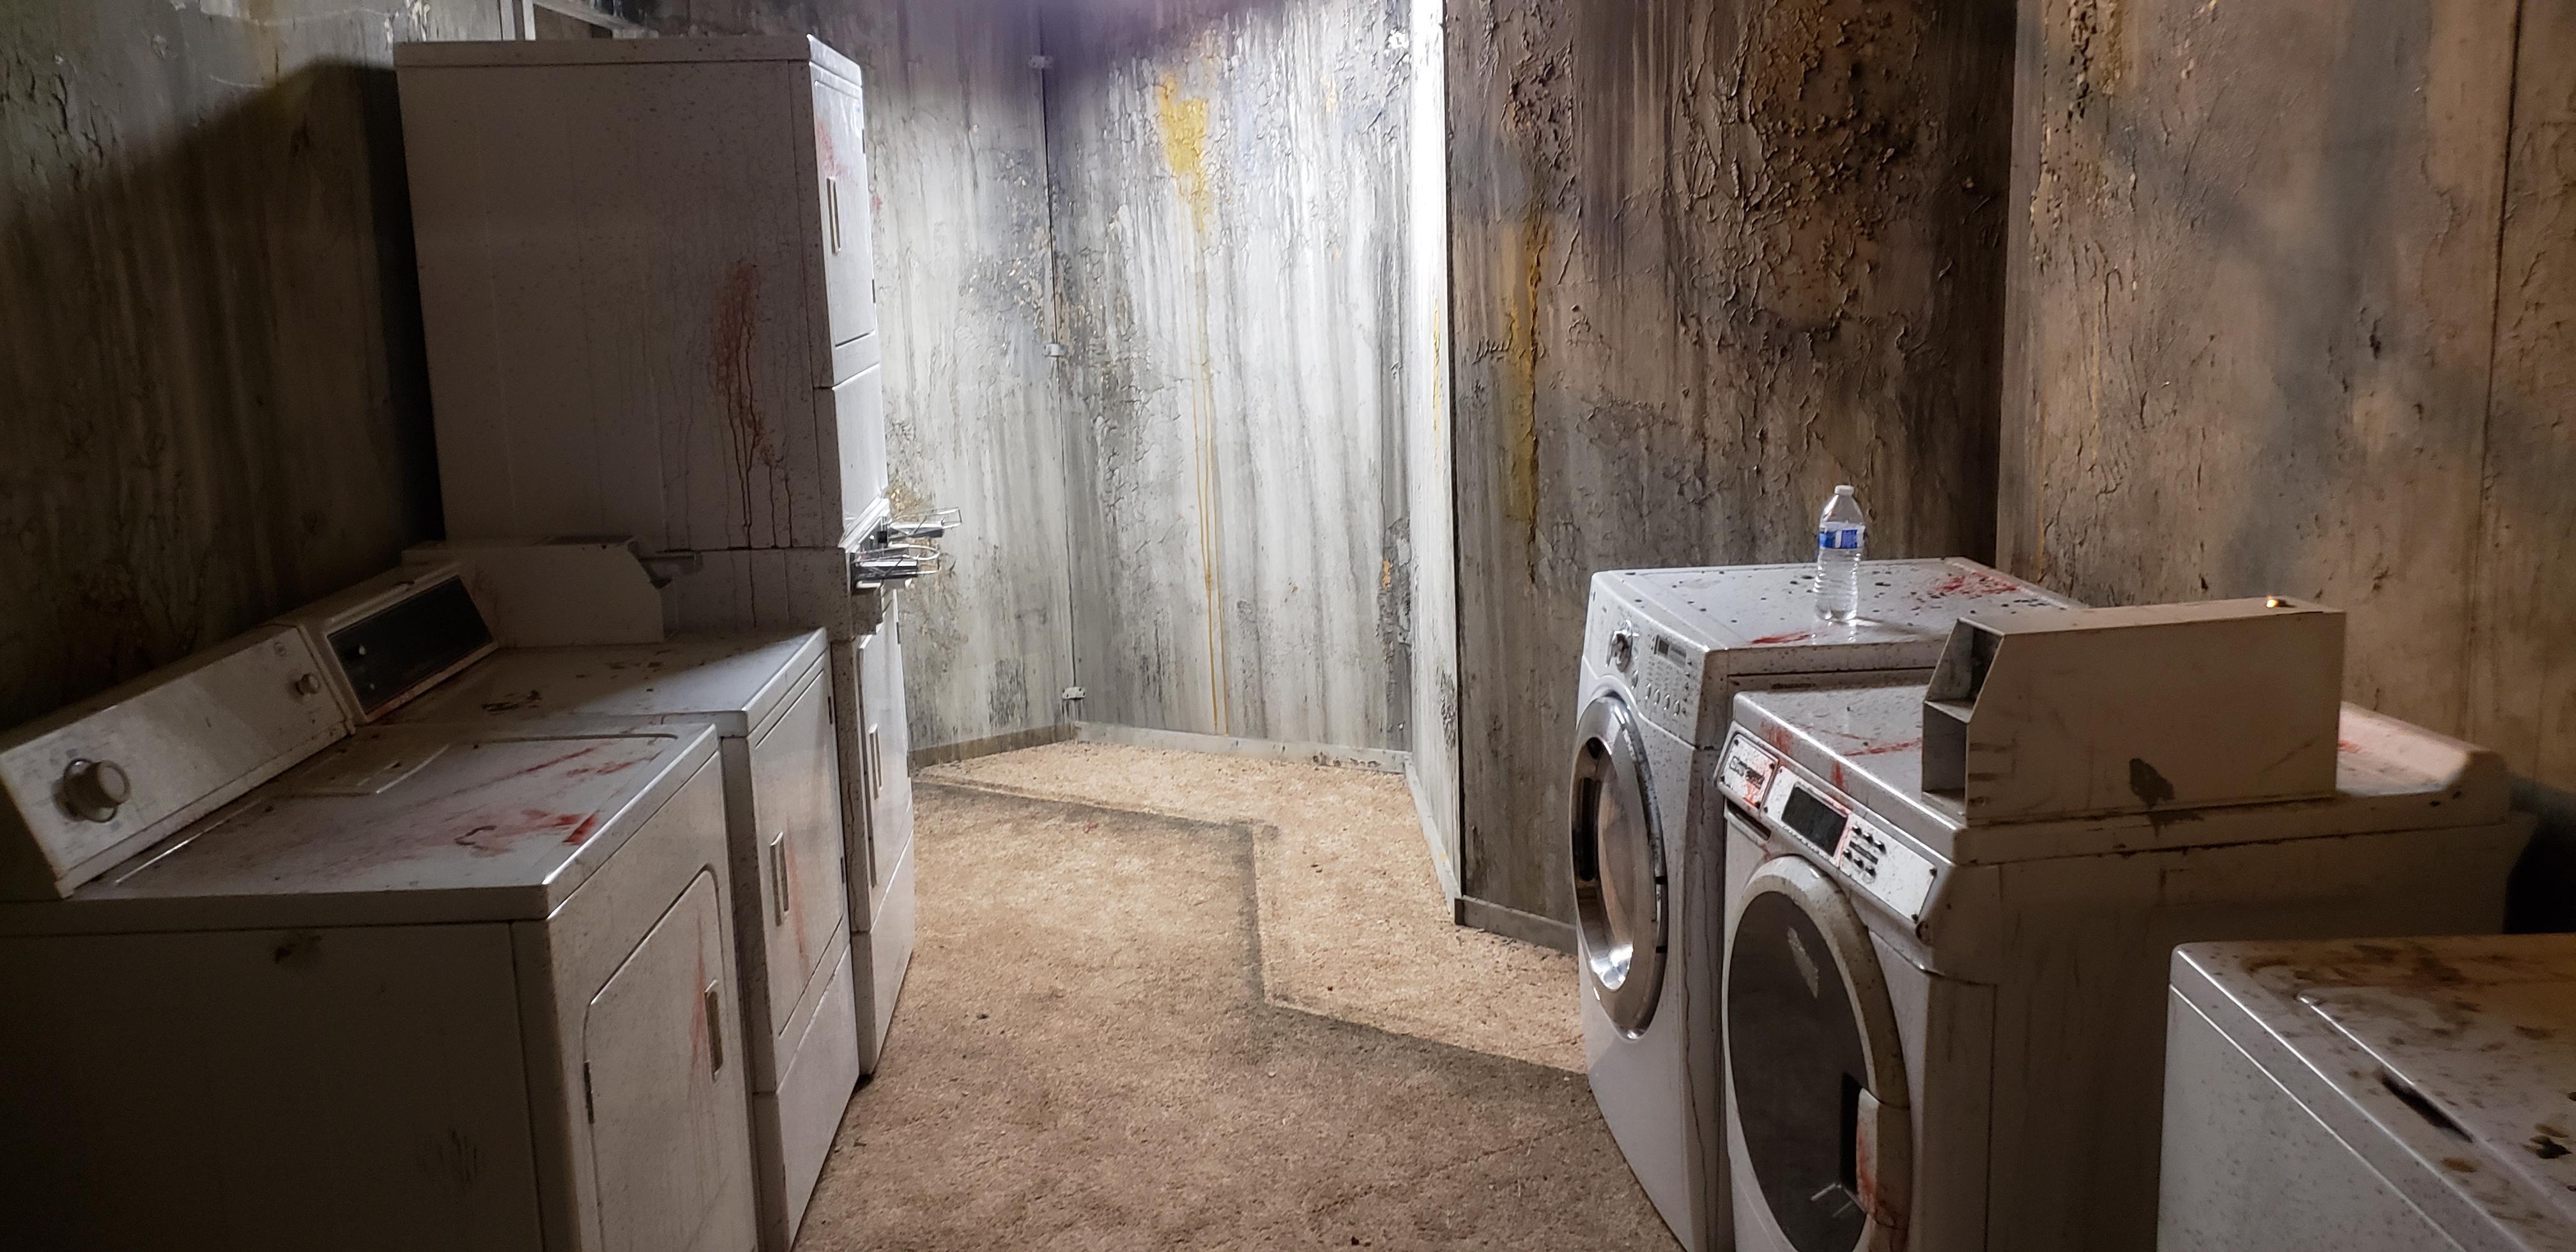 21 9 Laundromat